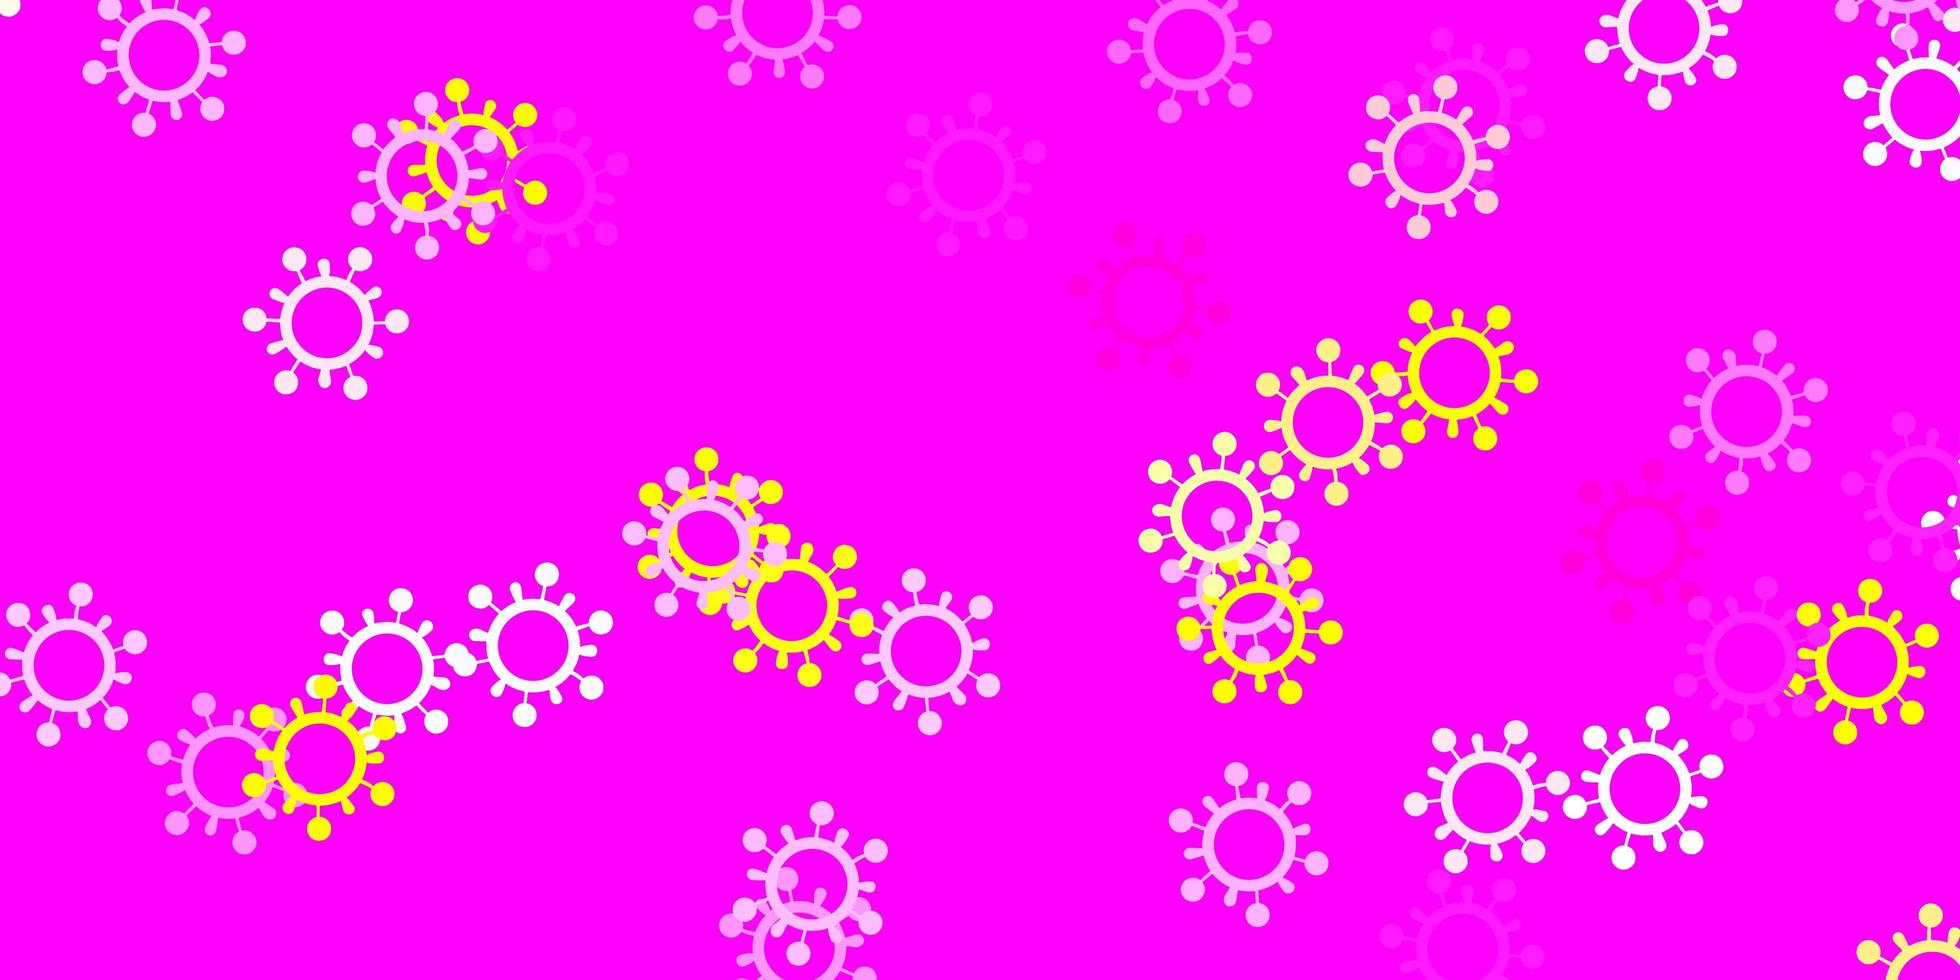 hellrosa, gelber Vektorhintergrund mit covid-19 Symbolen. vektor